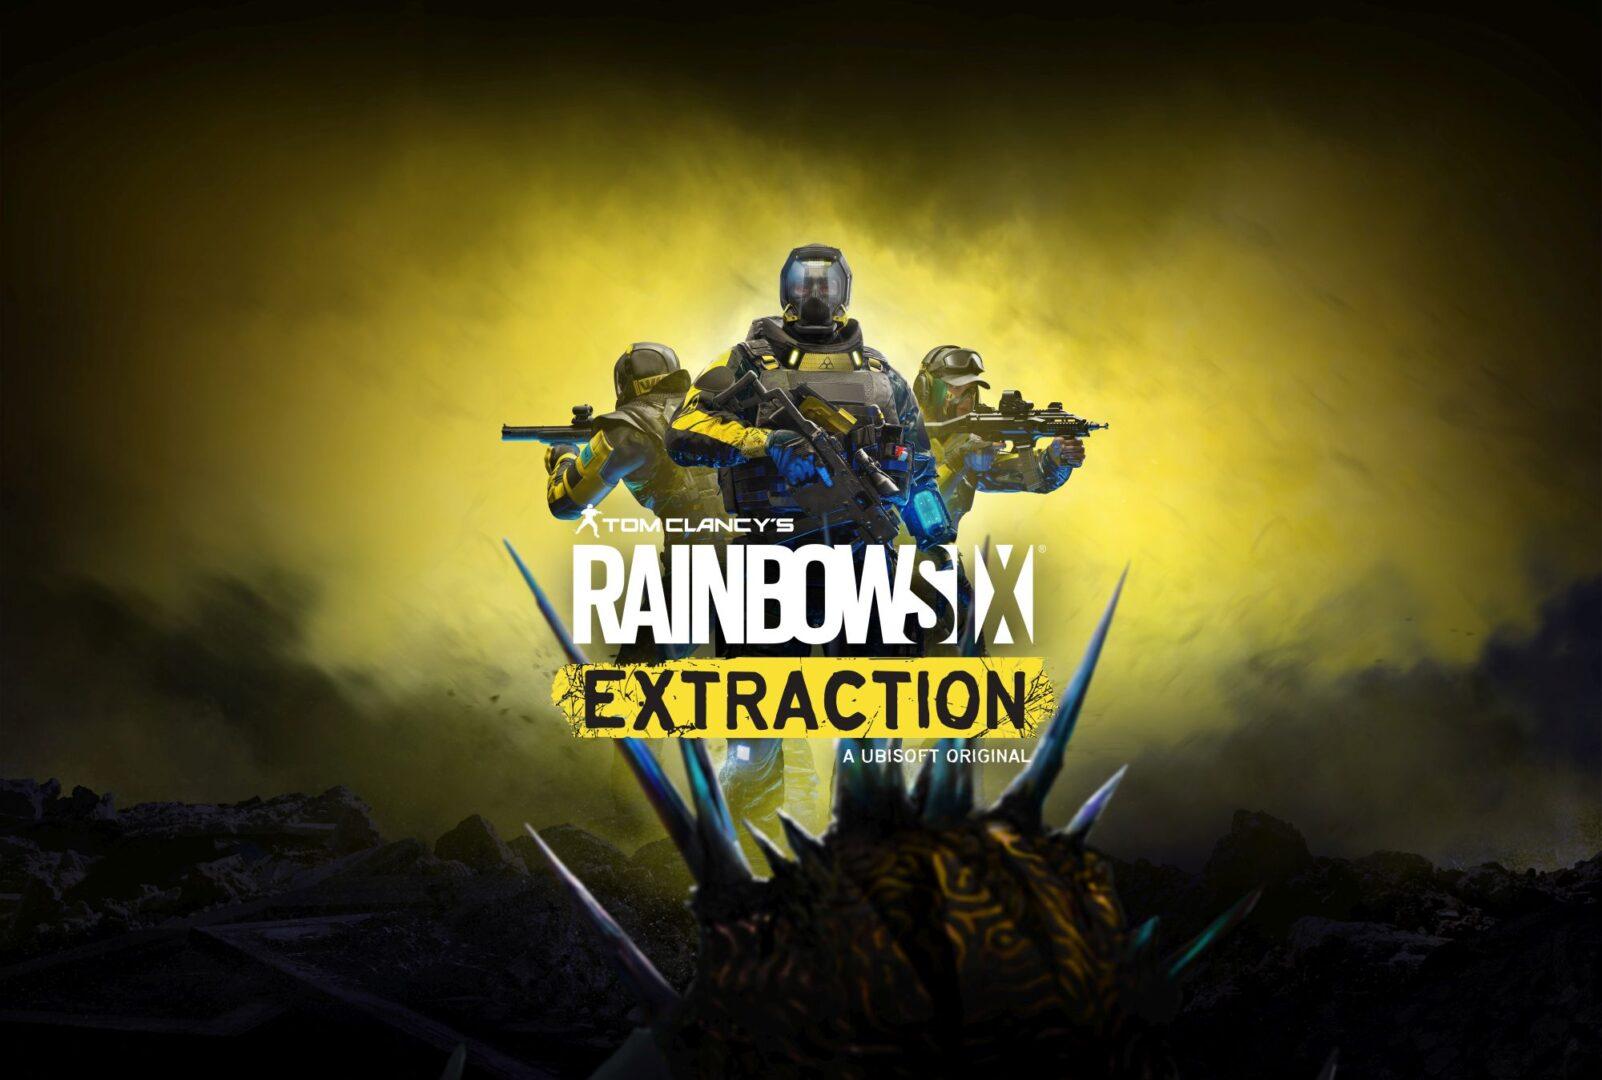 Rainbow-Six-Extraction-3.jpg?ssl=1